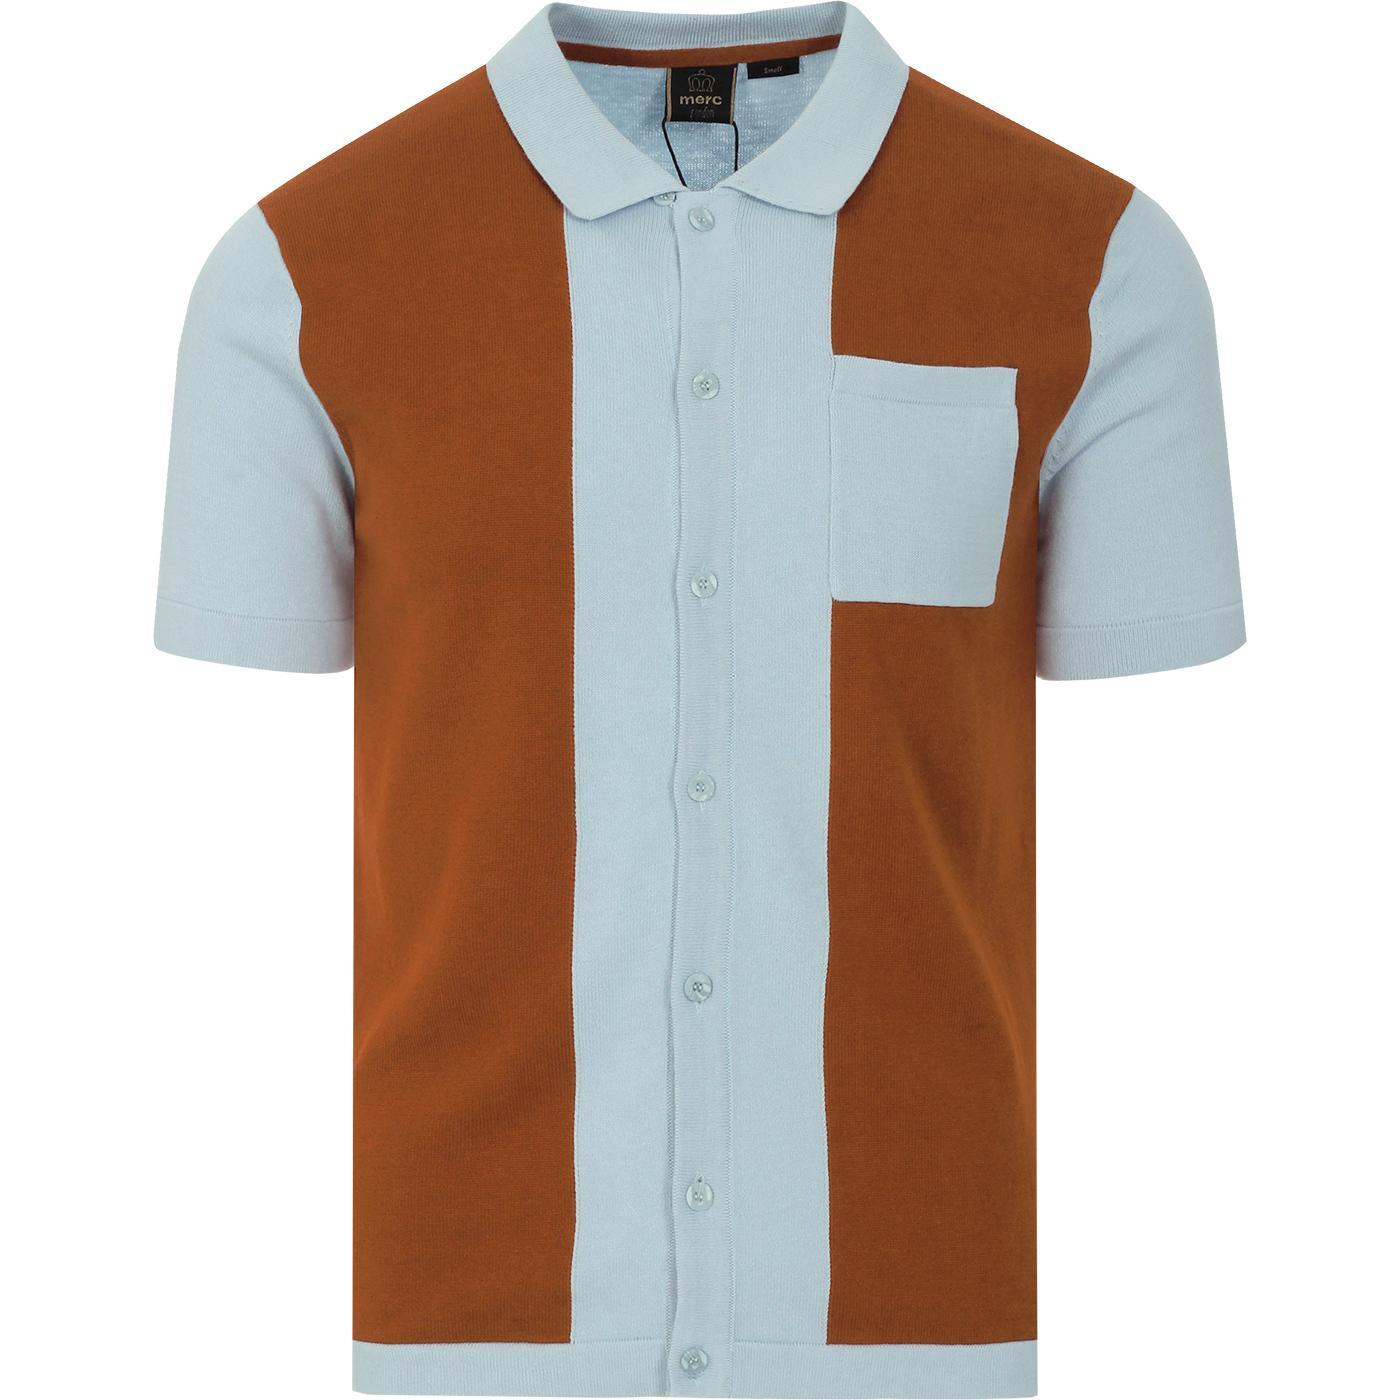 Conduit MERC Mod Panel Knit Pocket Polo Cardigan